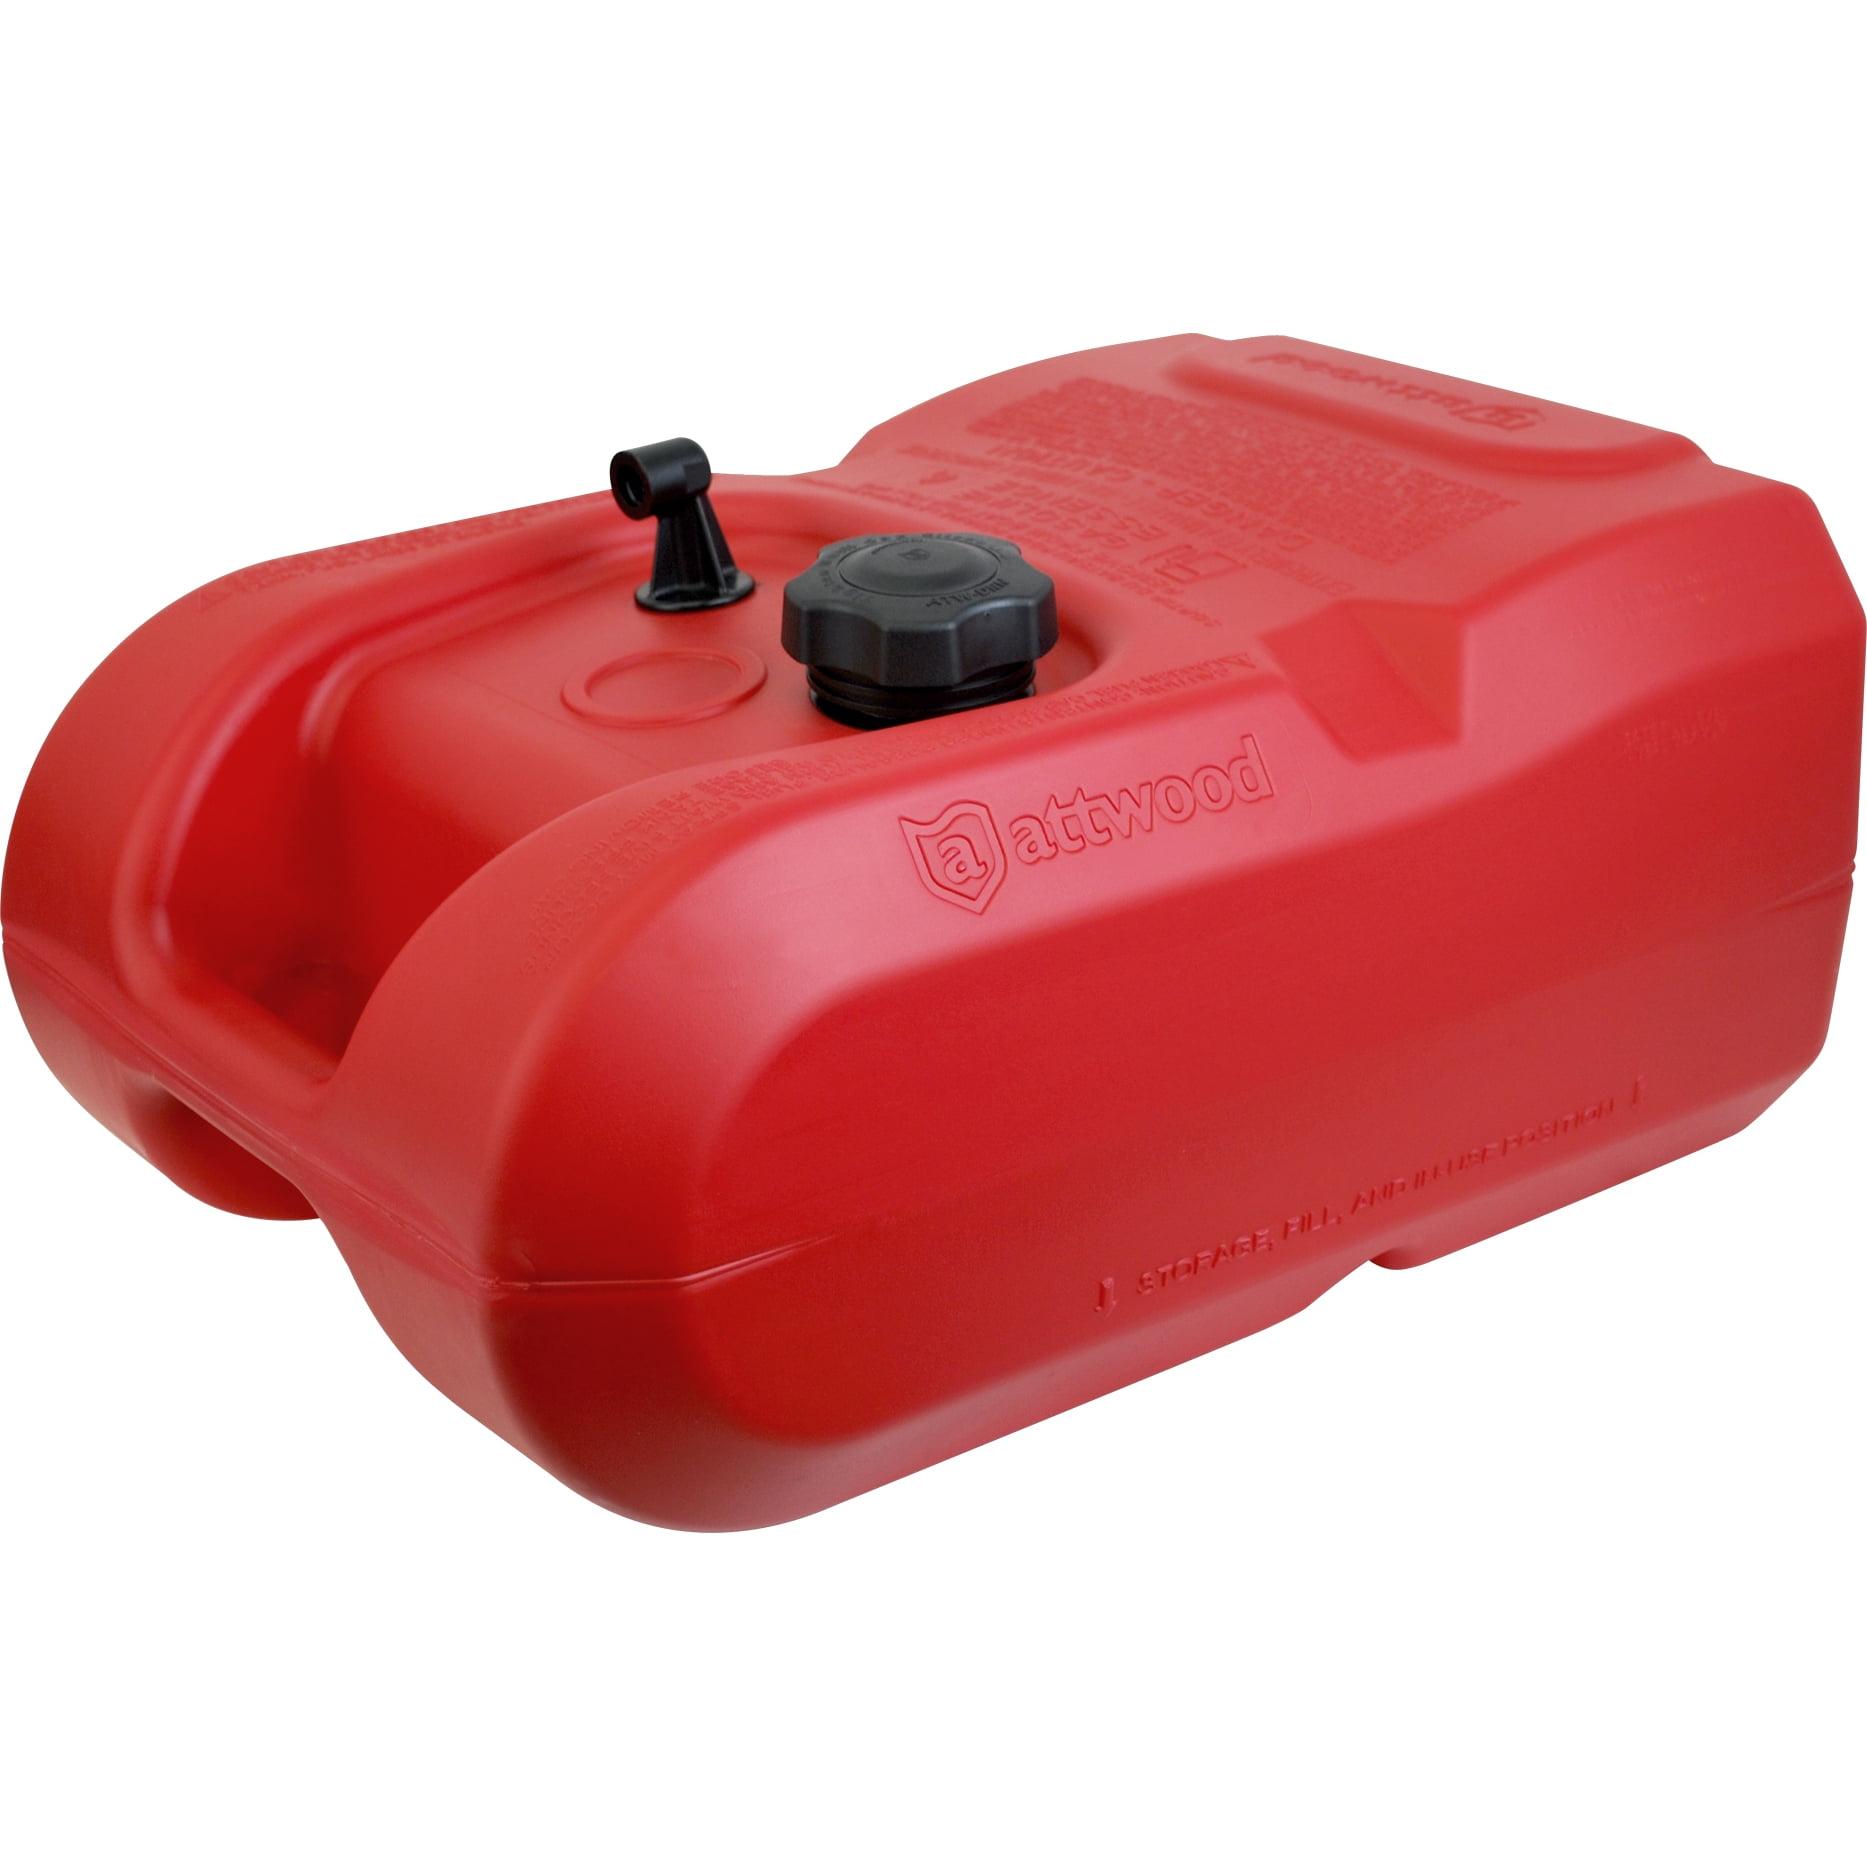 Attwood 8806LP2 8806LP2; 6-Gal Gas Tank 2011 Epa/Carb